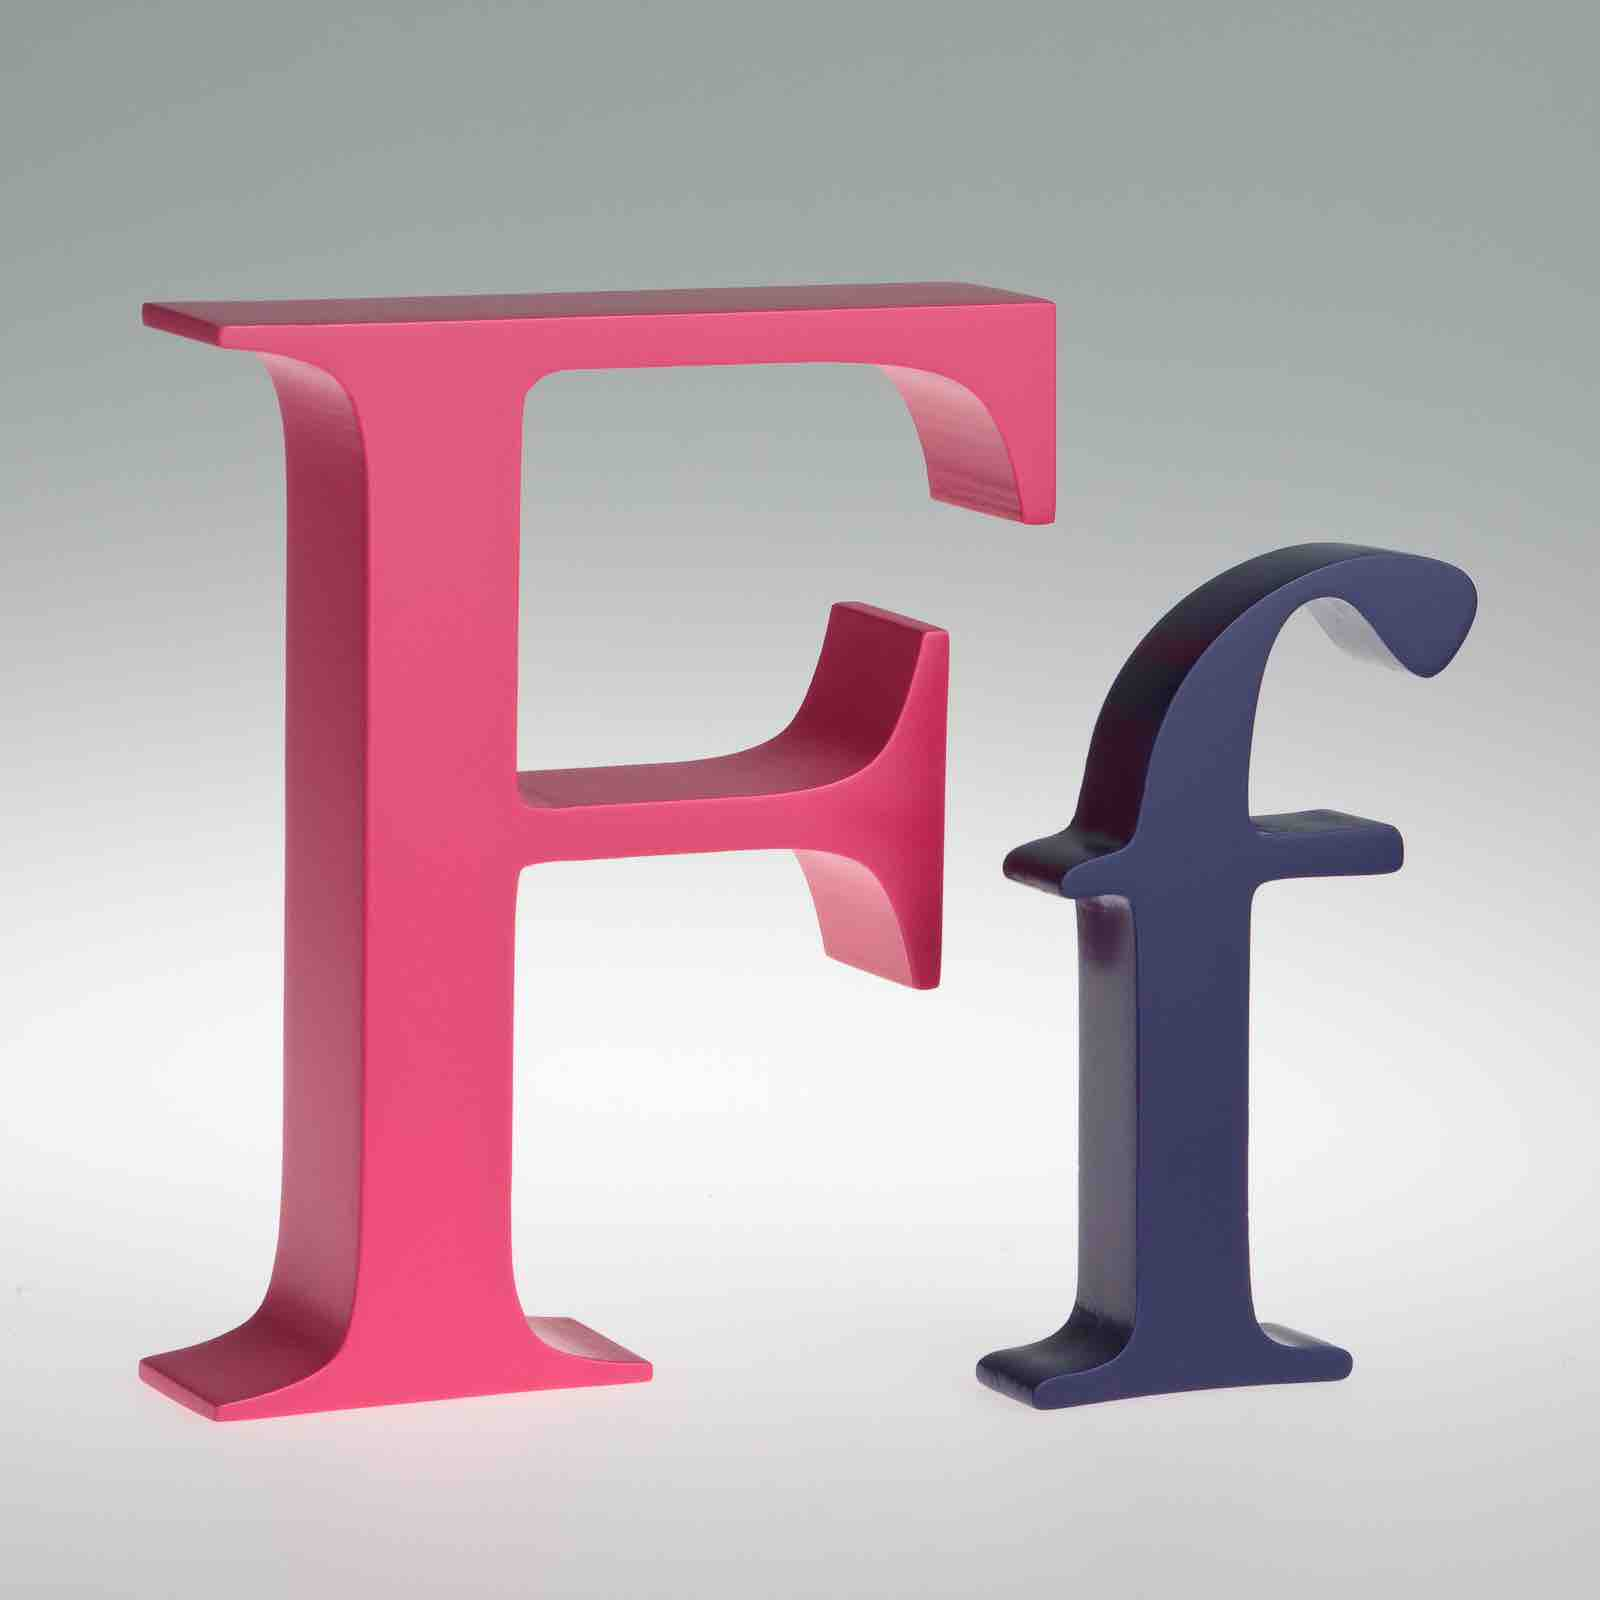 alpha-art-letter-f